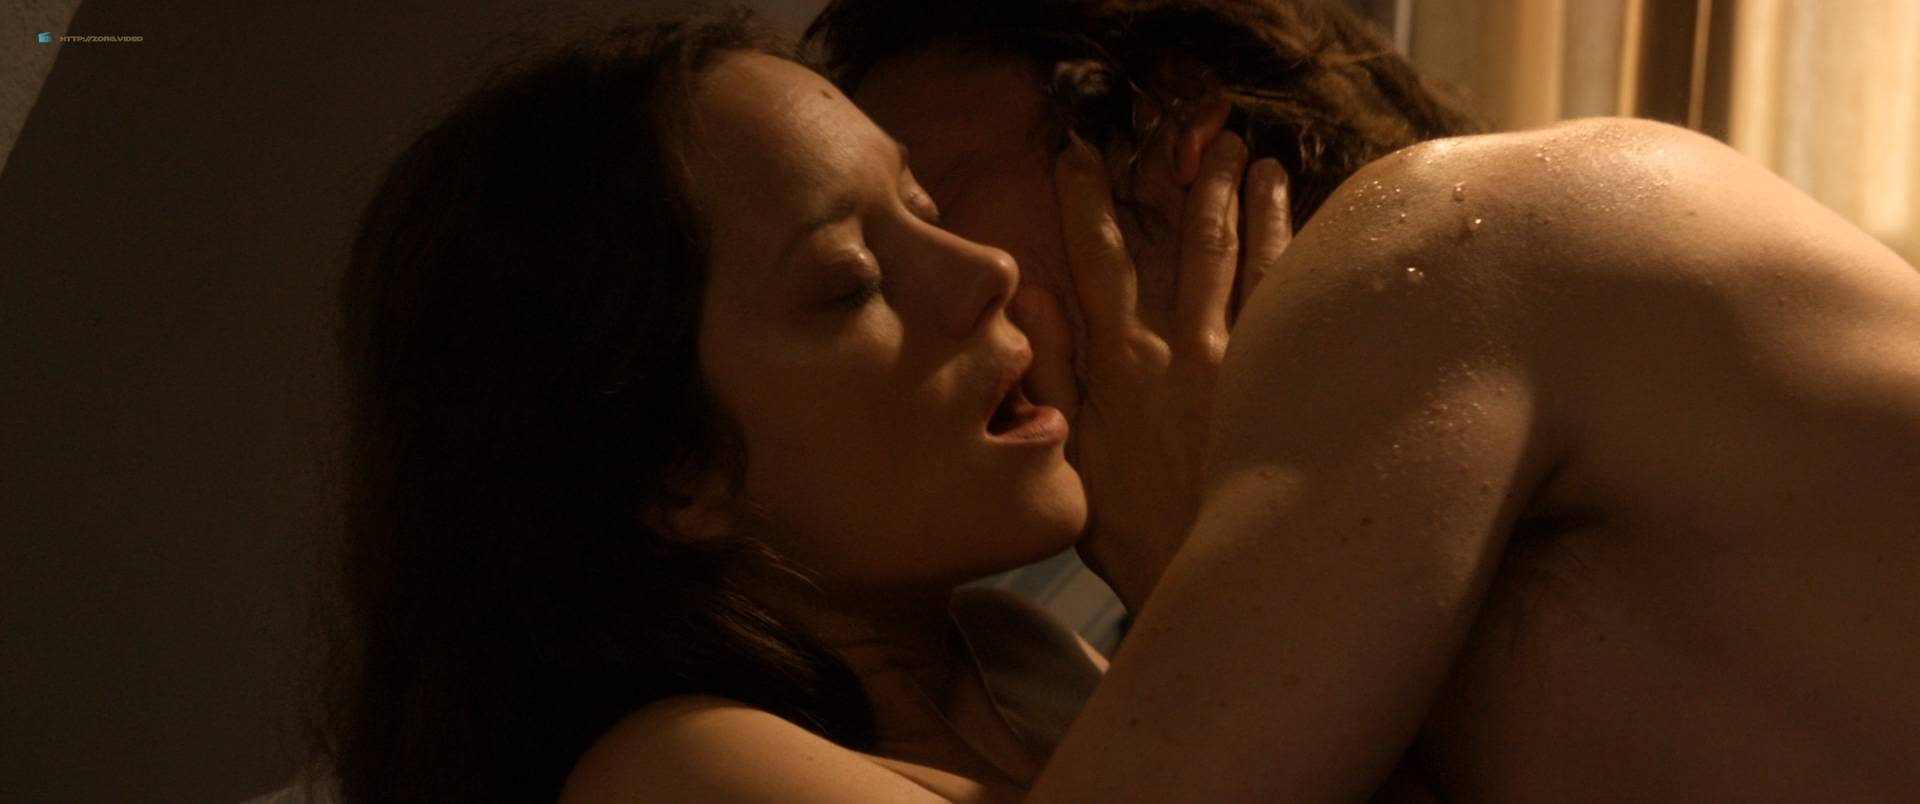 Marion-Cotillard-nude-full-frontal-Alba-Rohrwacher-nude-nipple-Les-fantomes-d_Ismael-FR-2017-HD-1080p-BluRay-012.jpg